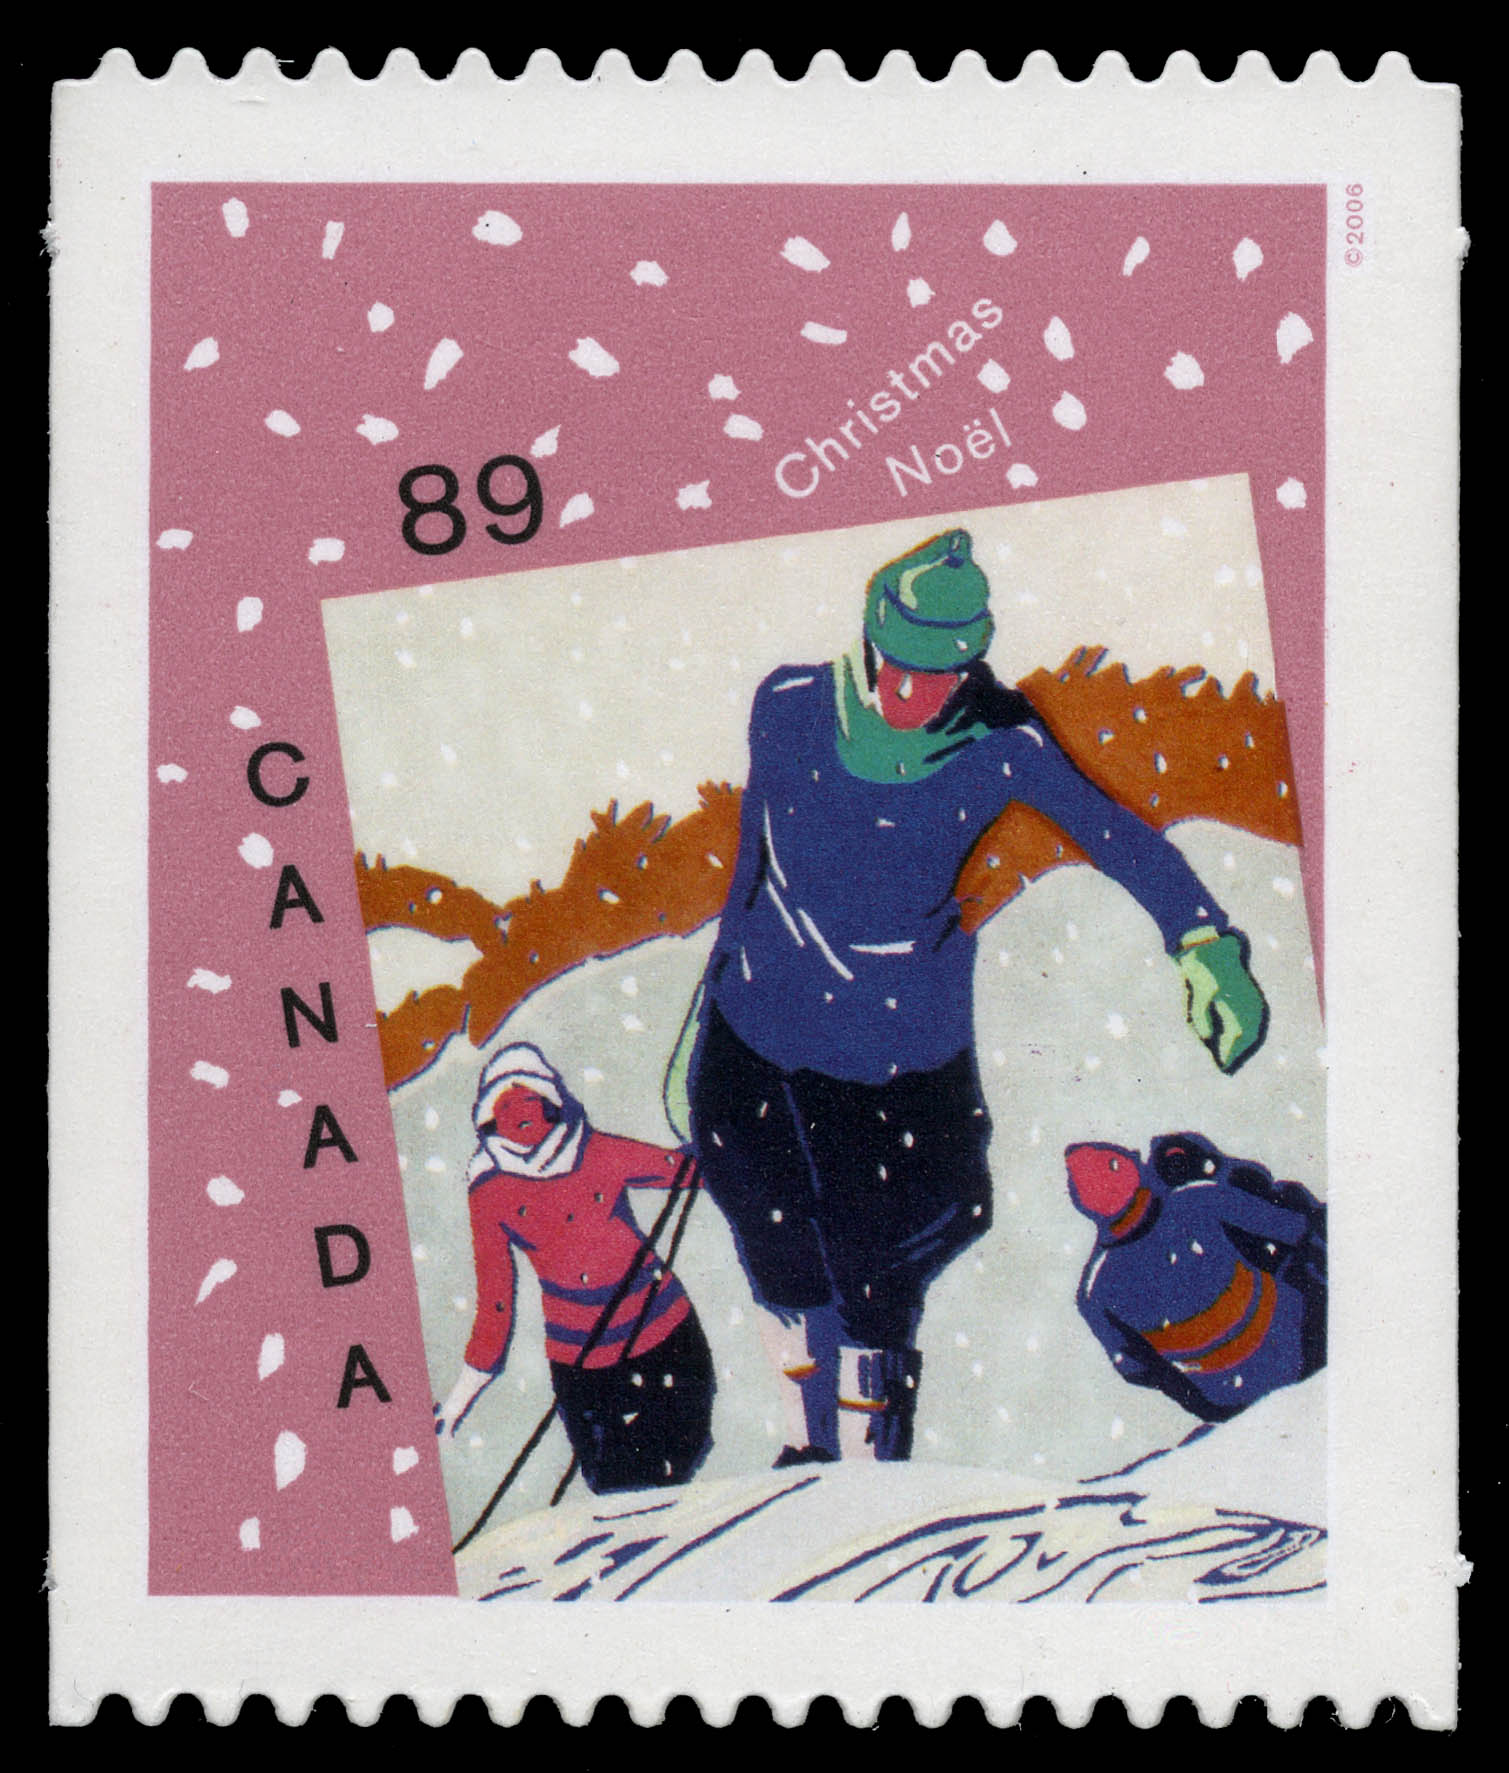 Winter Joys Canada Postage Stamp | Christmas : Christmas cards